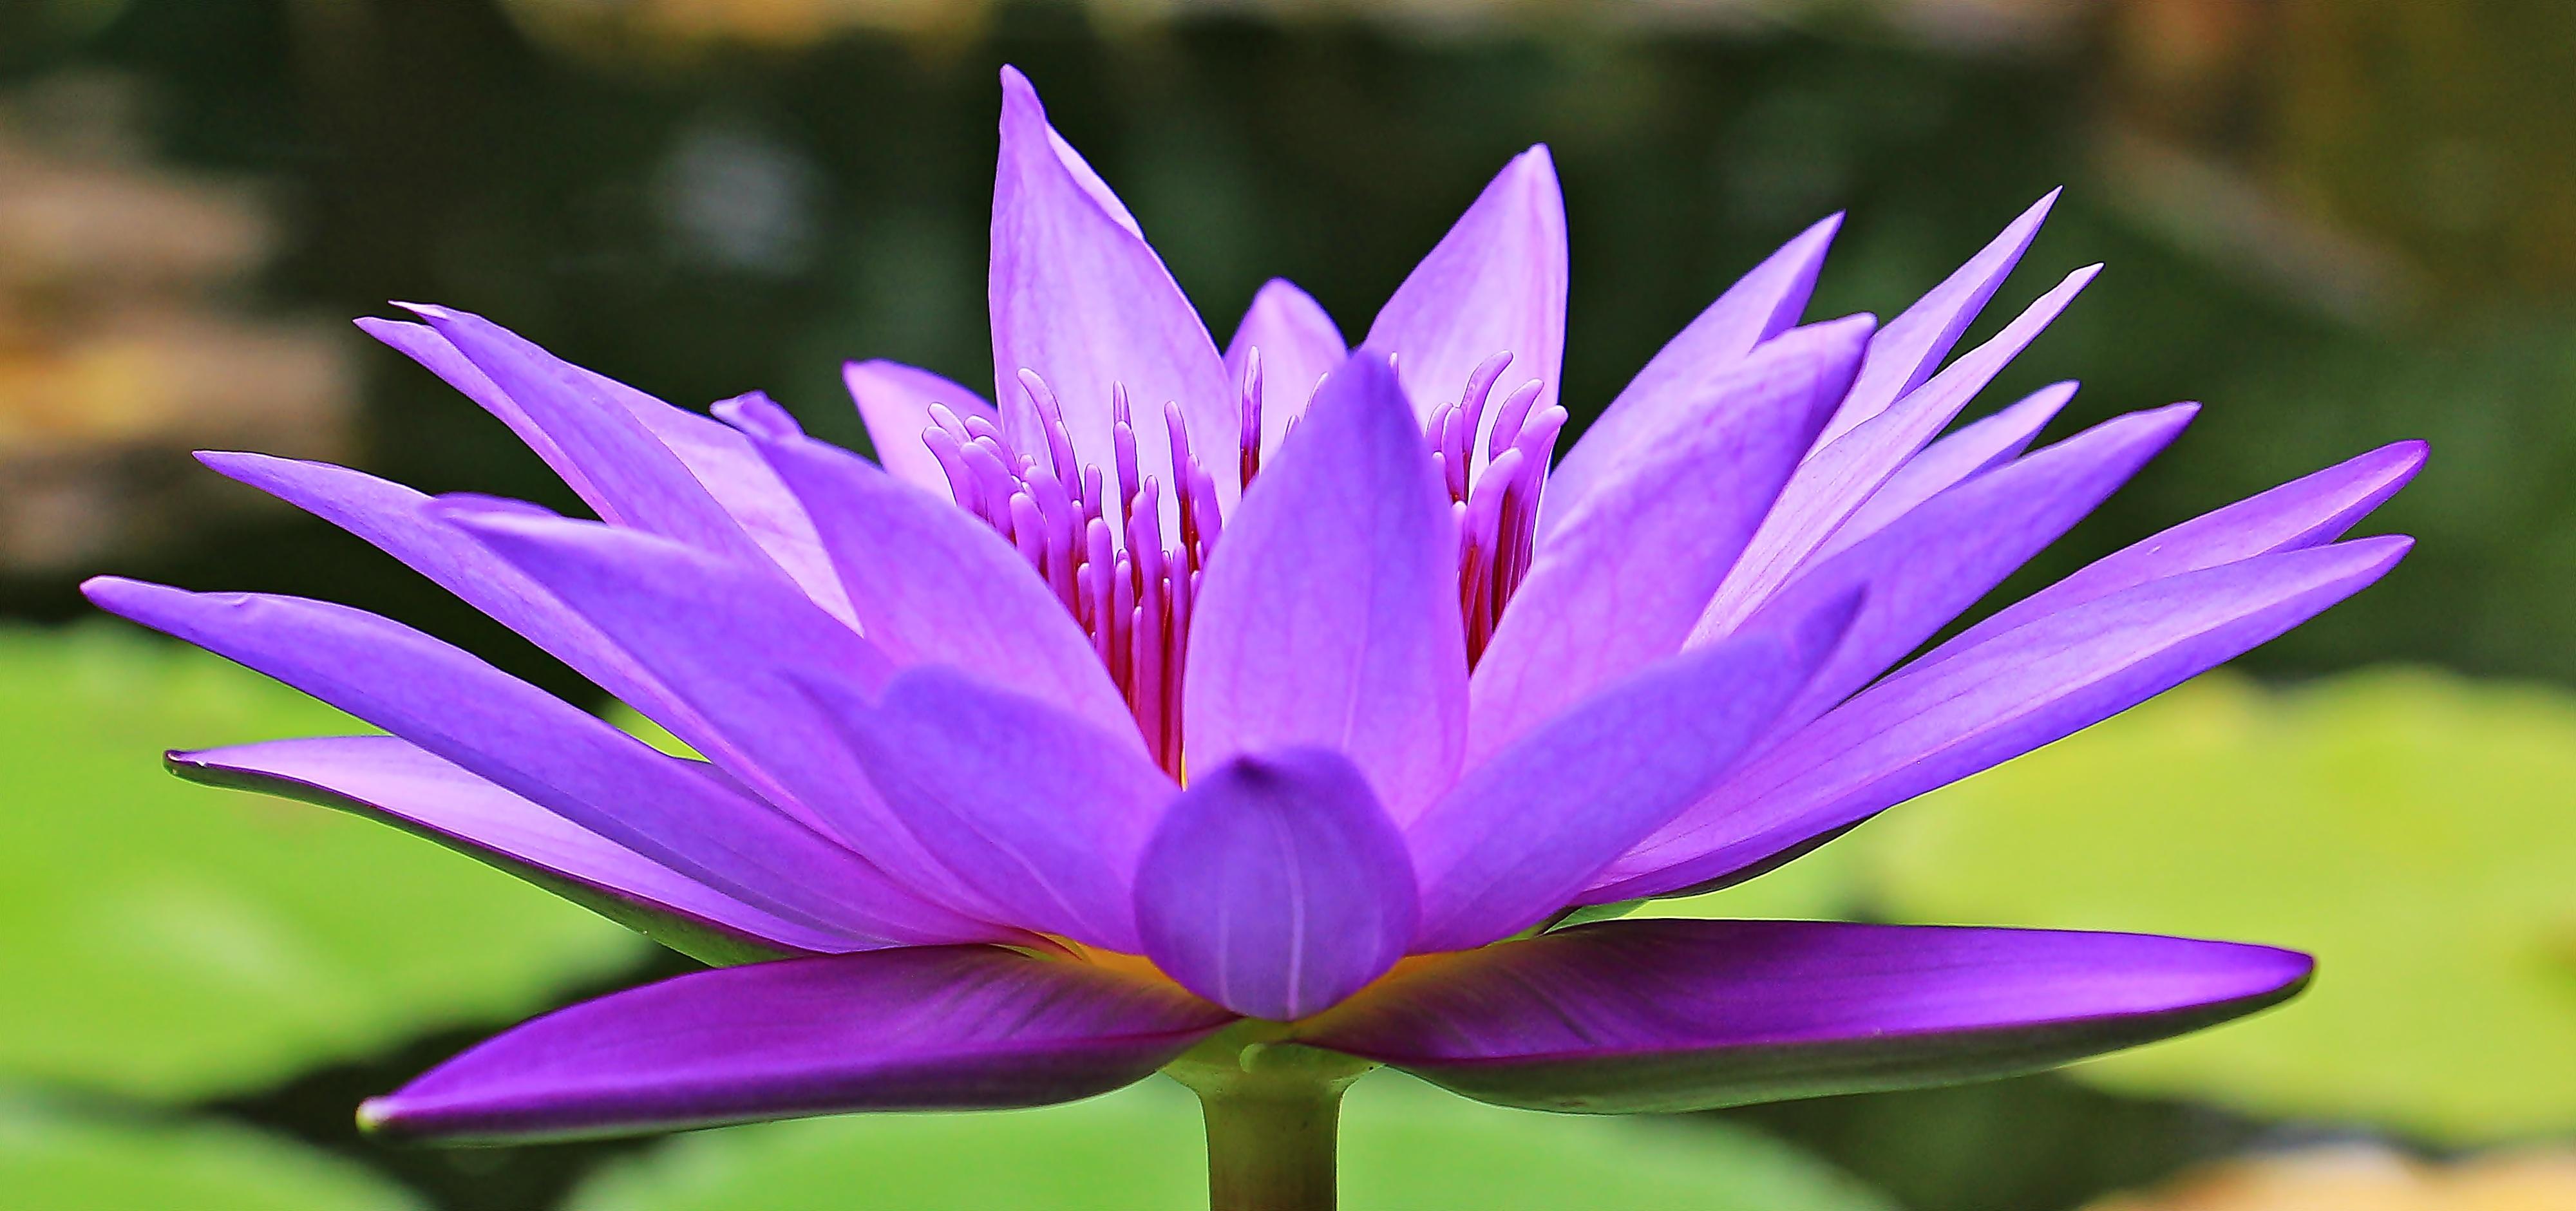 Free Images Nature Petal Bloom Summer Botany Sacred Lotus